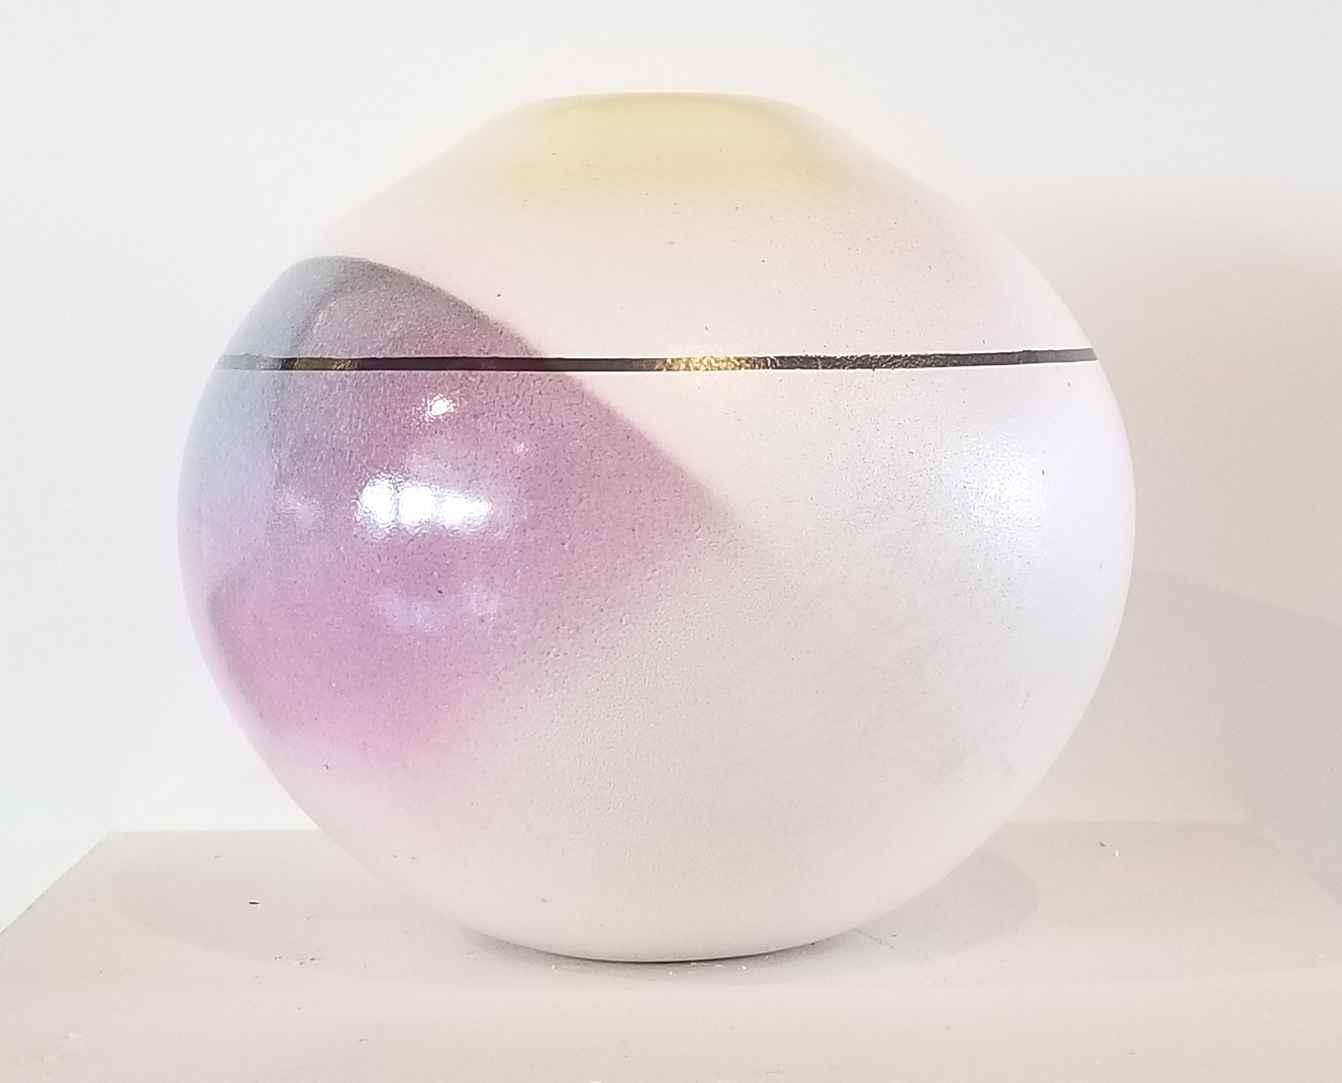 White Ocular Vessel by Mr. Tom Gross - Masterpiece Online